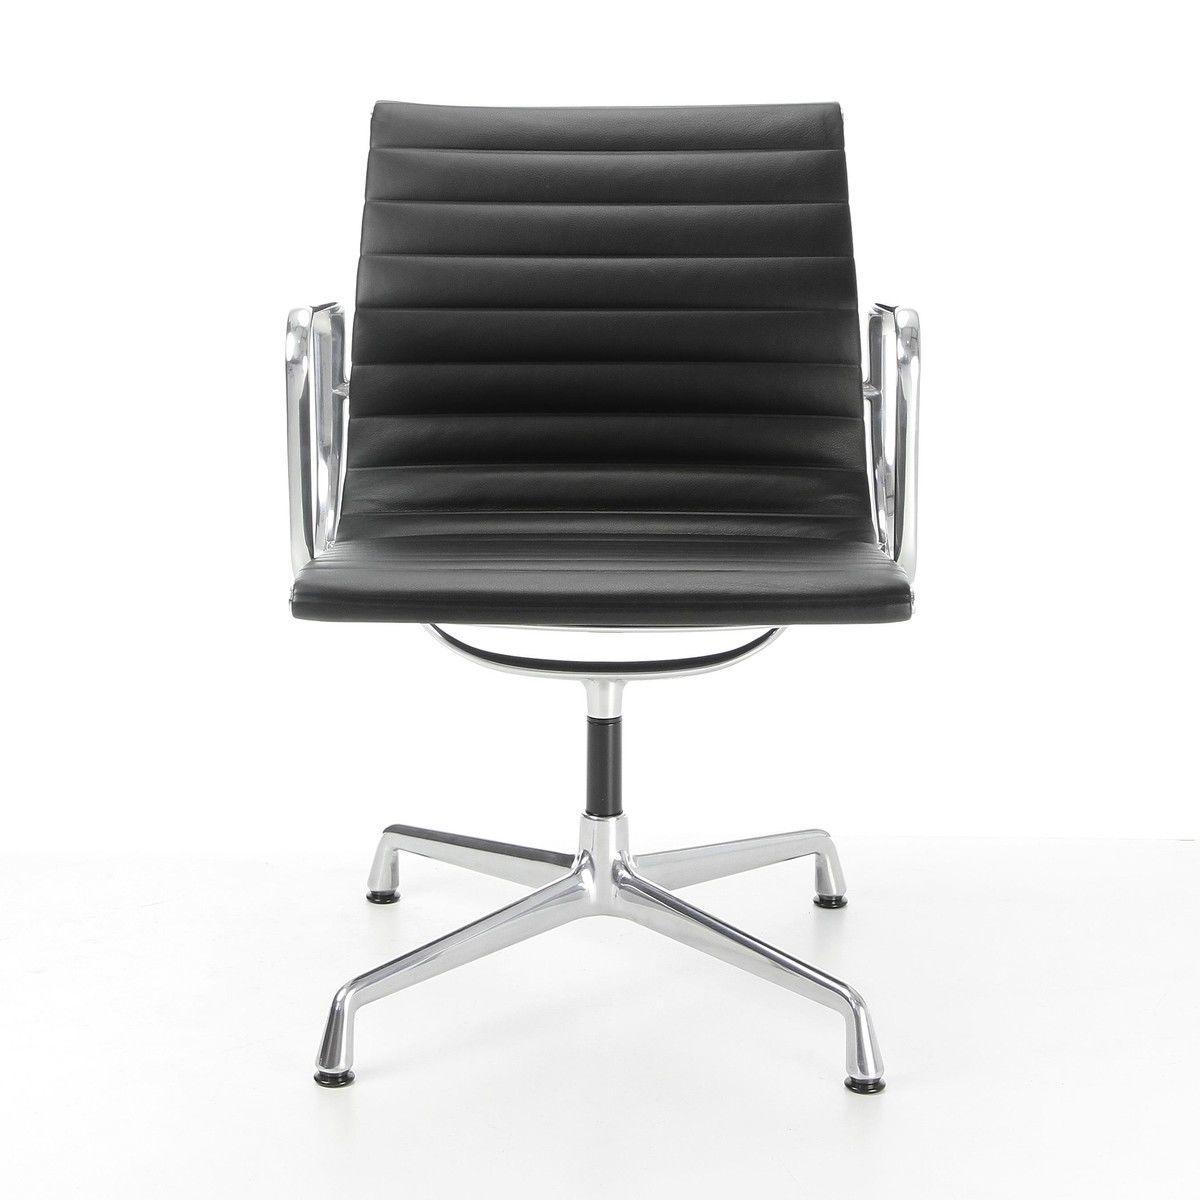 vitra ea 108 aluminium chair chaise de bureau vitra. Black Bedroom Furniture Sets. Home Design Ideas